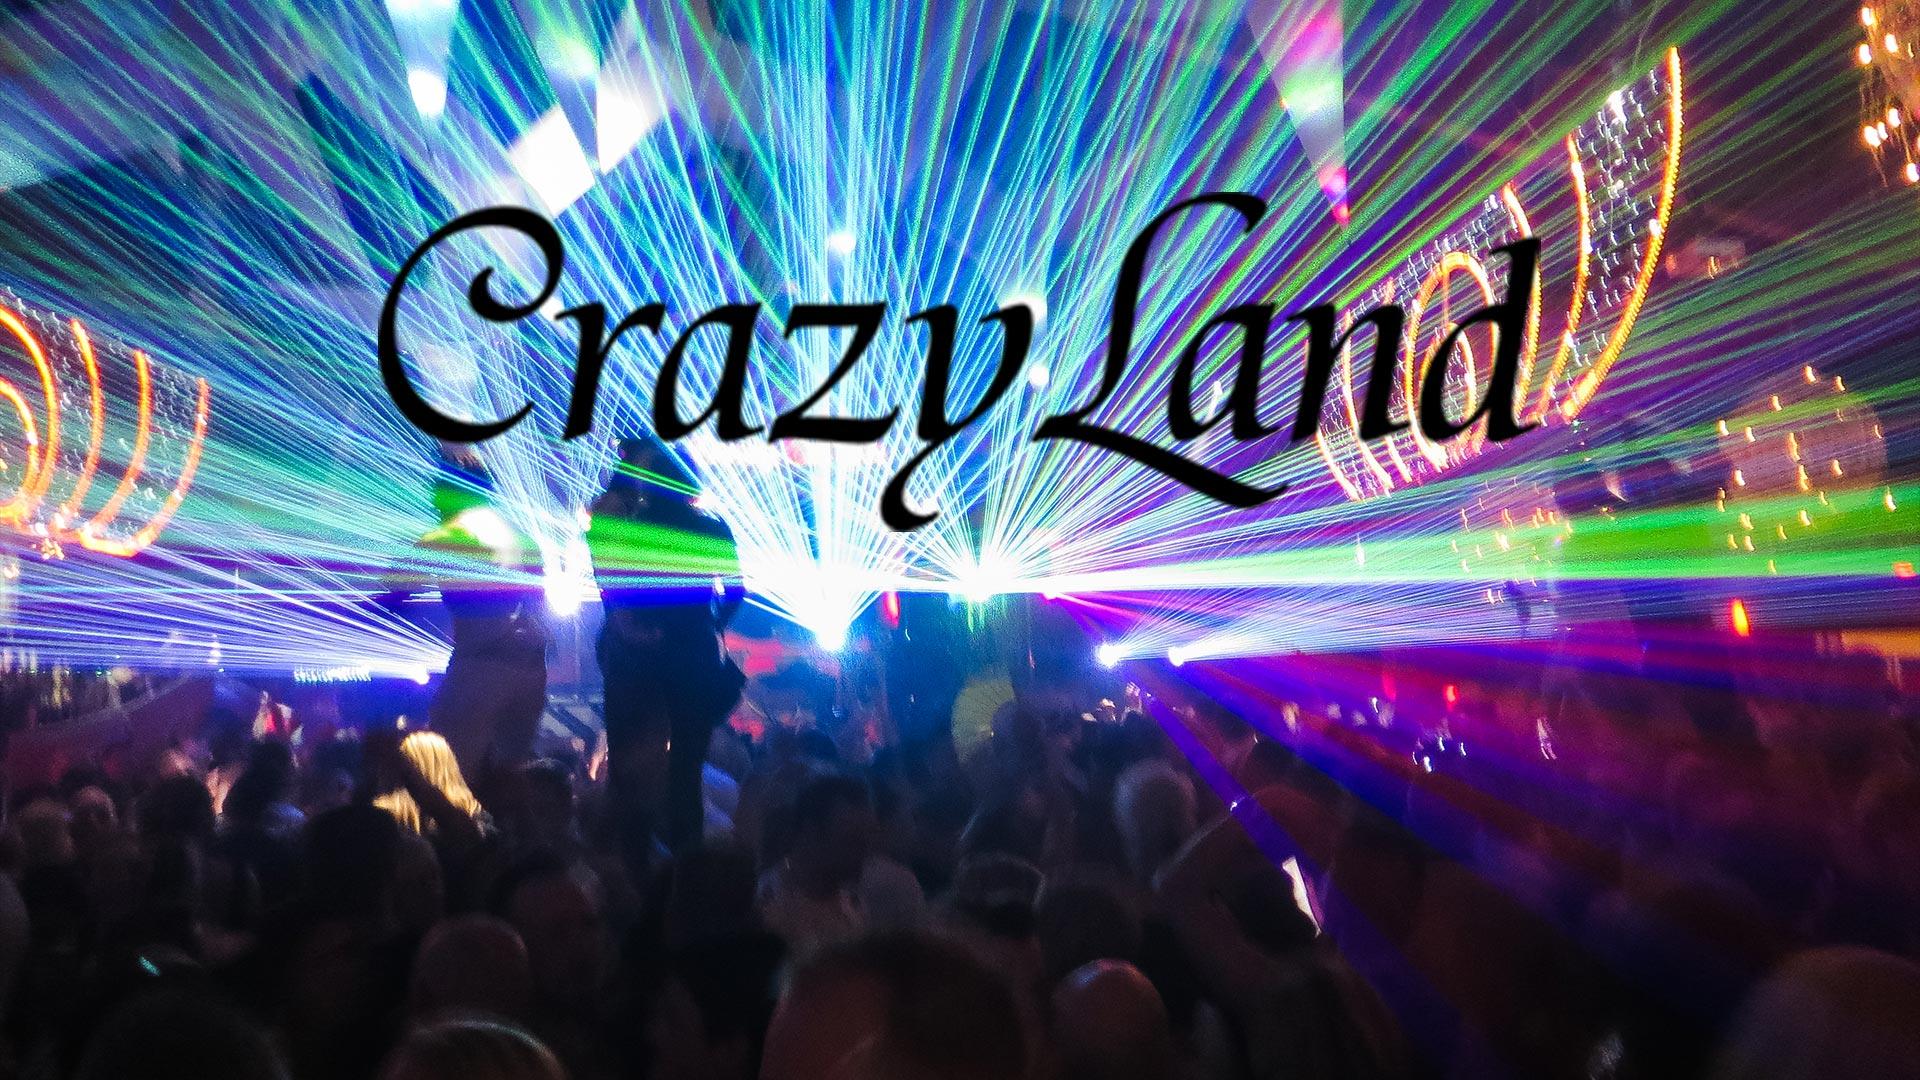 Crazyland